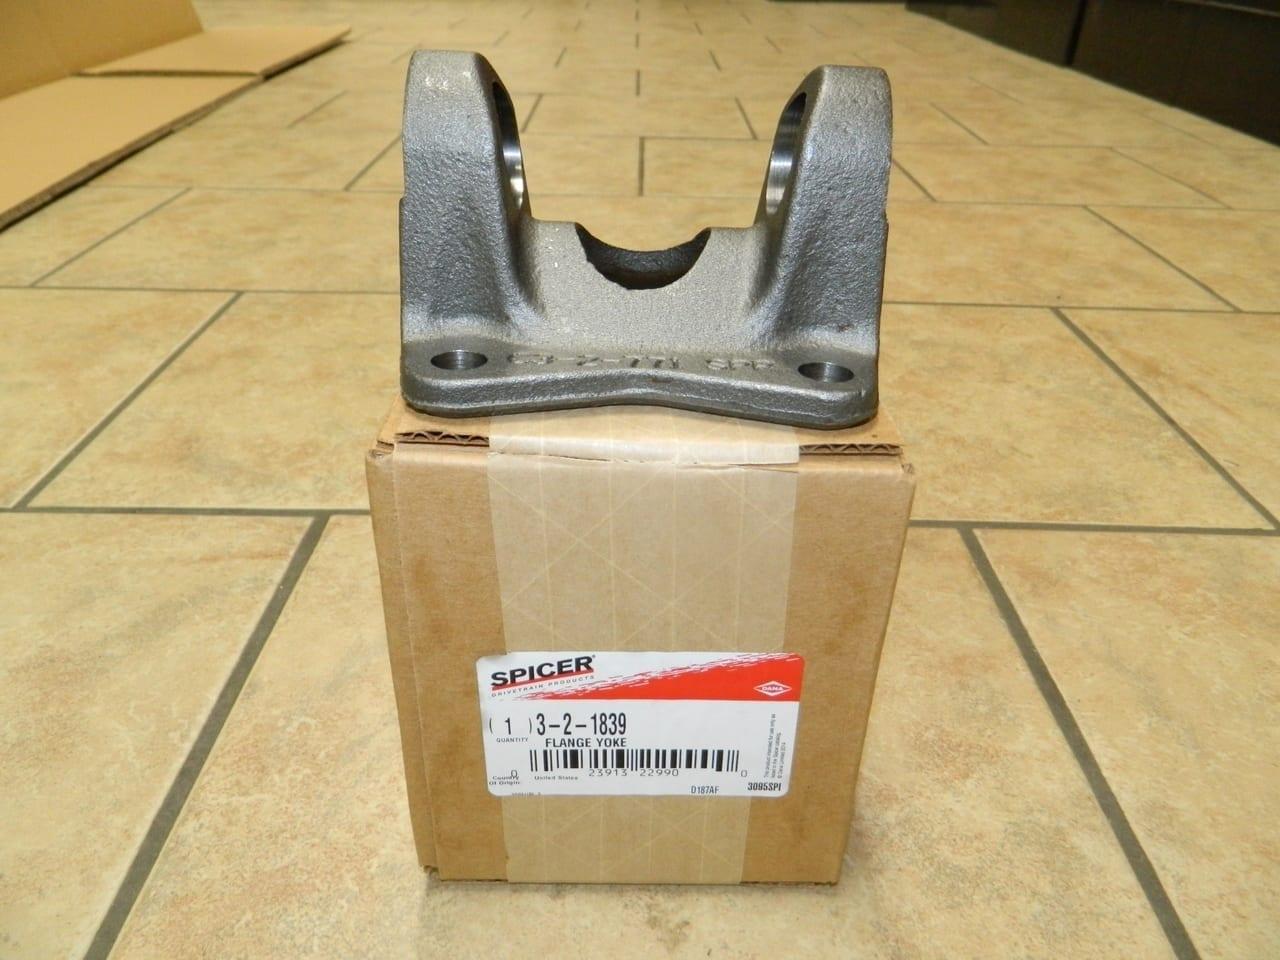 Ford F350 Rear Driveshaft Flange Yoke 1410 1998+ 4 Bolt Universal Joint